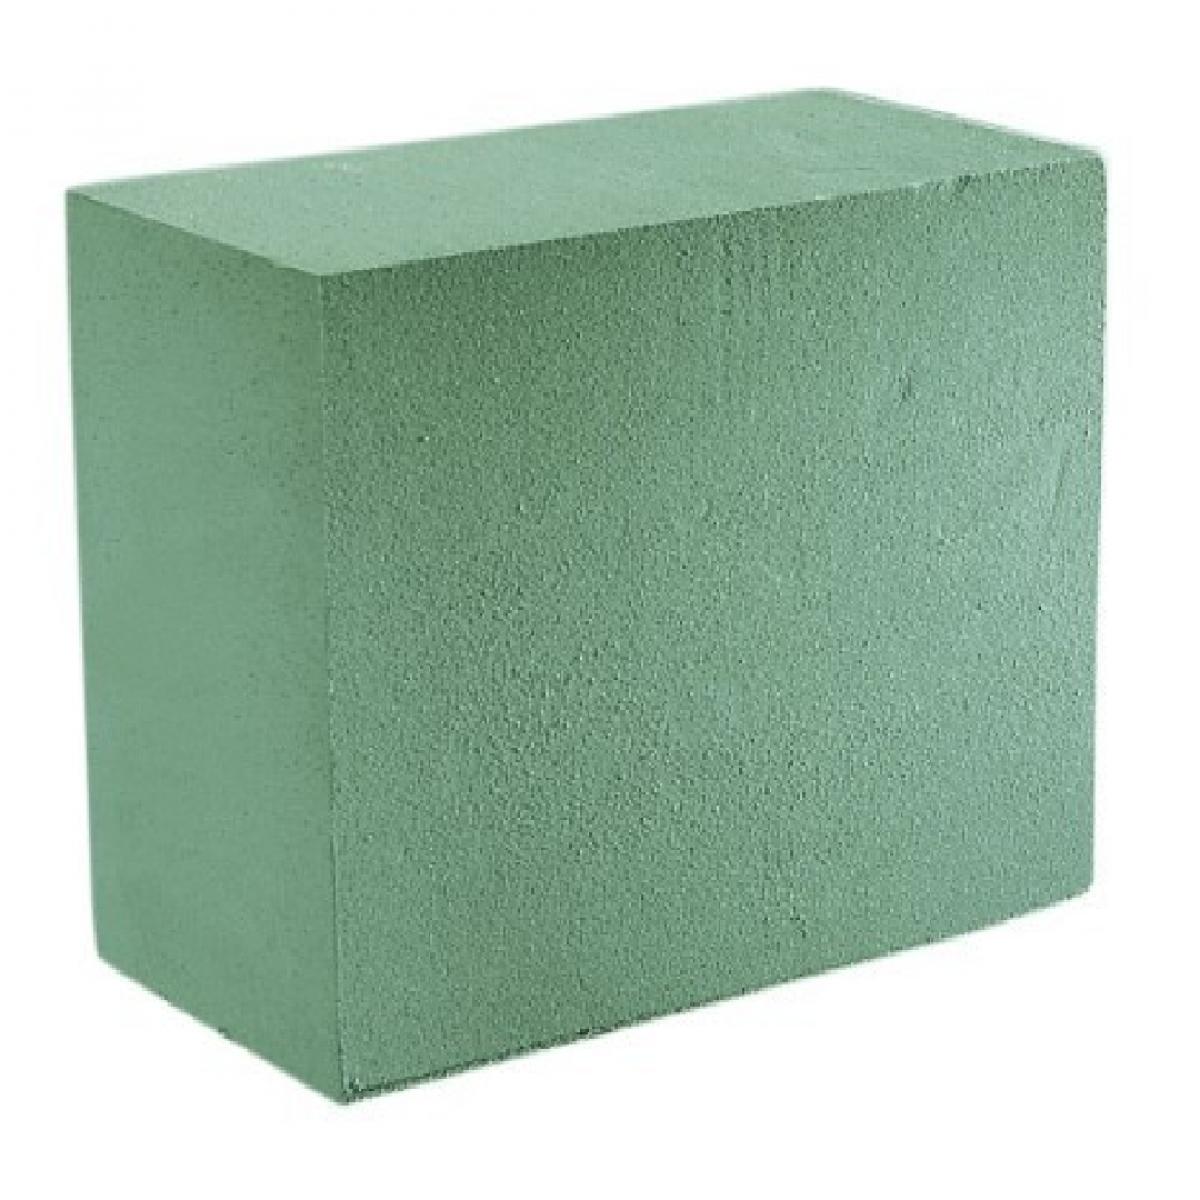 Oasis Advantage Floral  Foam Block full - 1x1